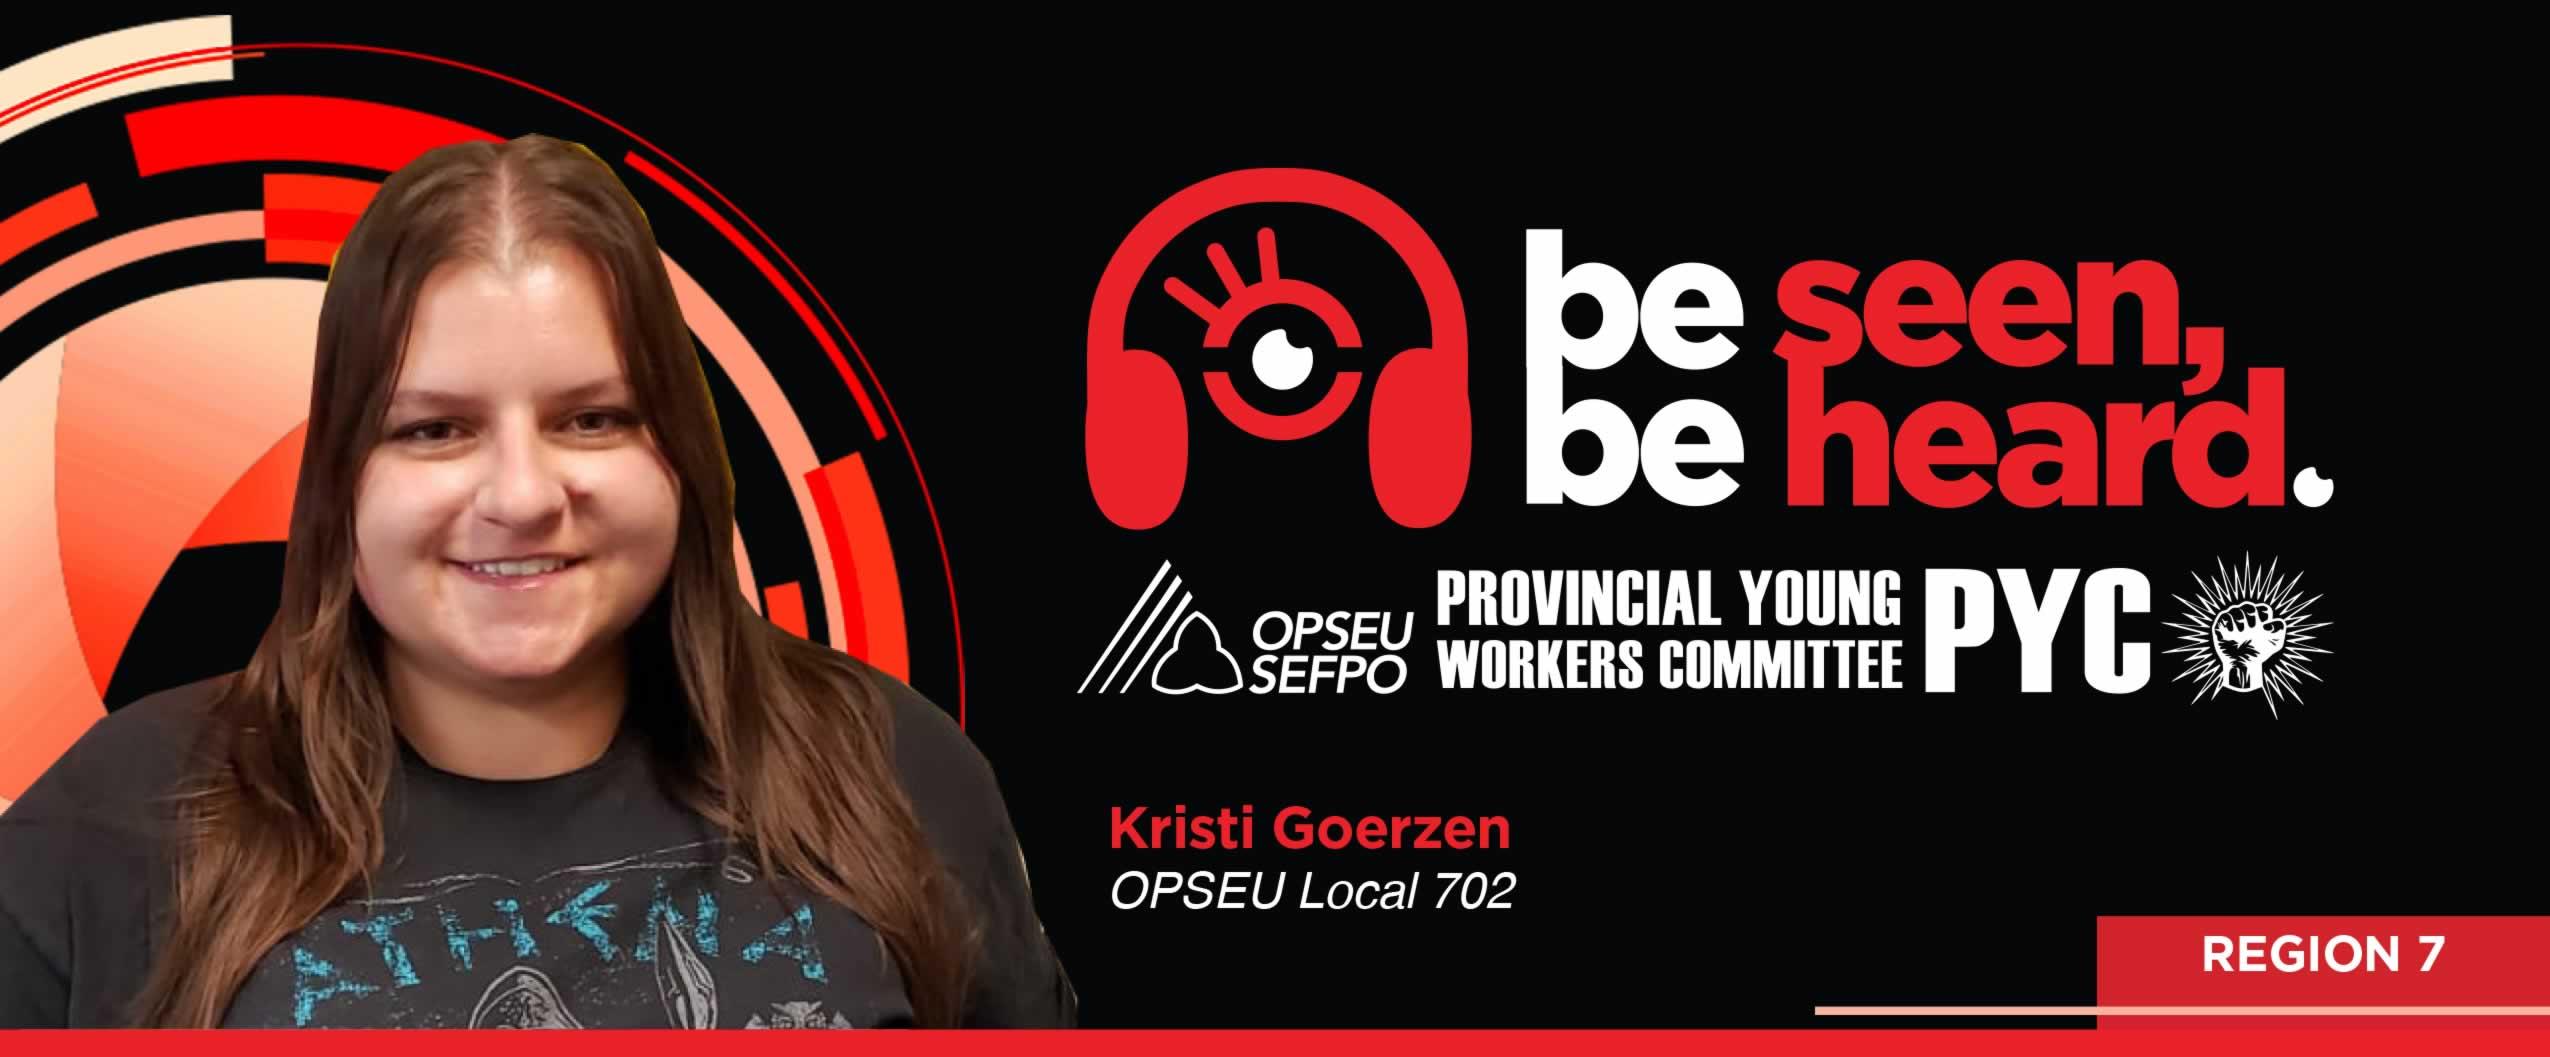 Be Seen Be Heard: Photo of Kristi Goerzen, OPSEU Local 702, PYC